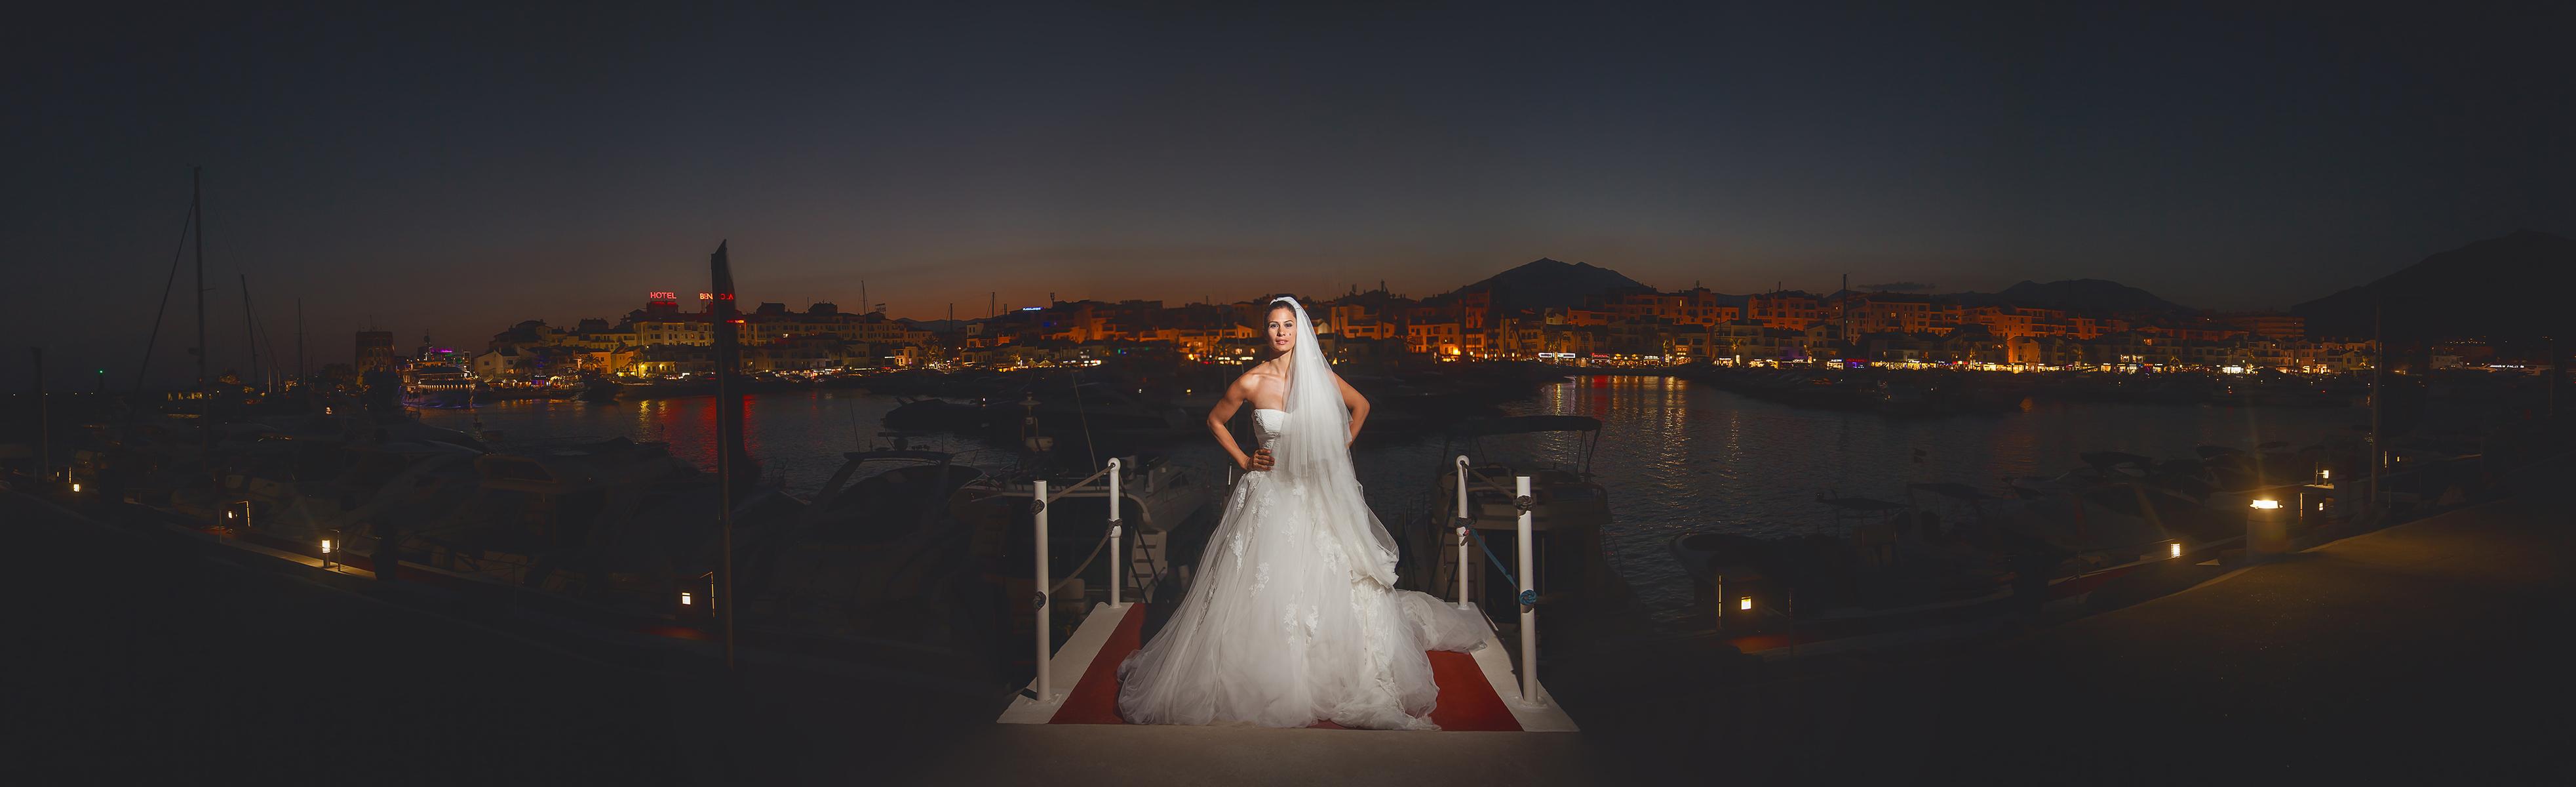 Wedding Portrait Engagement Photographer Malta